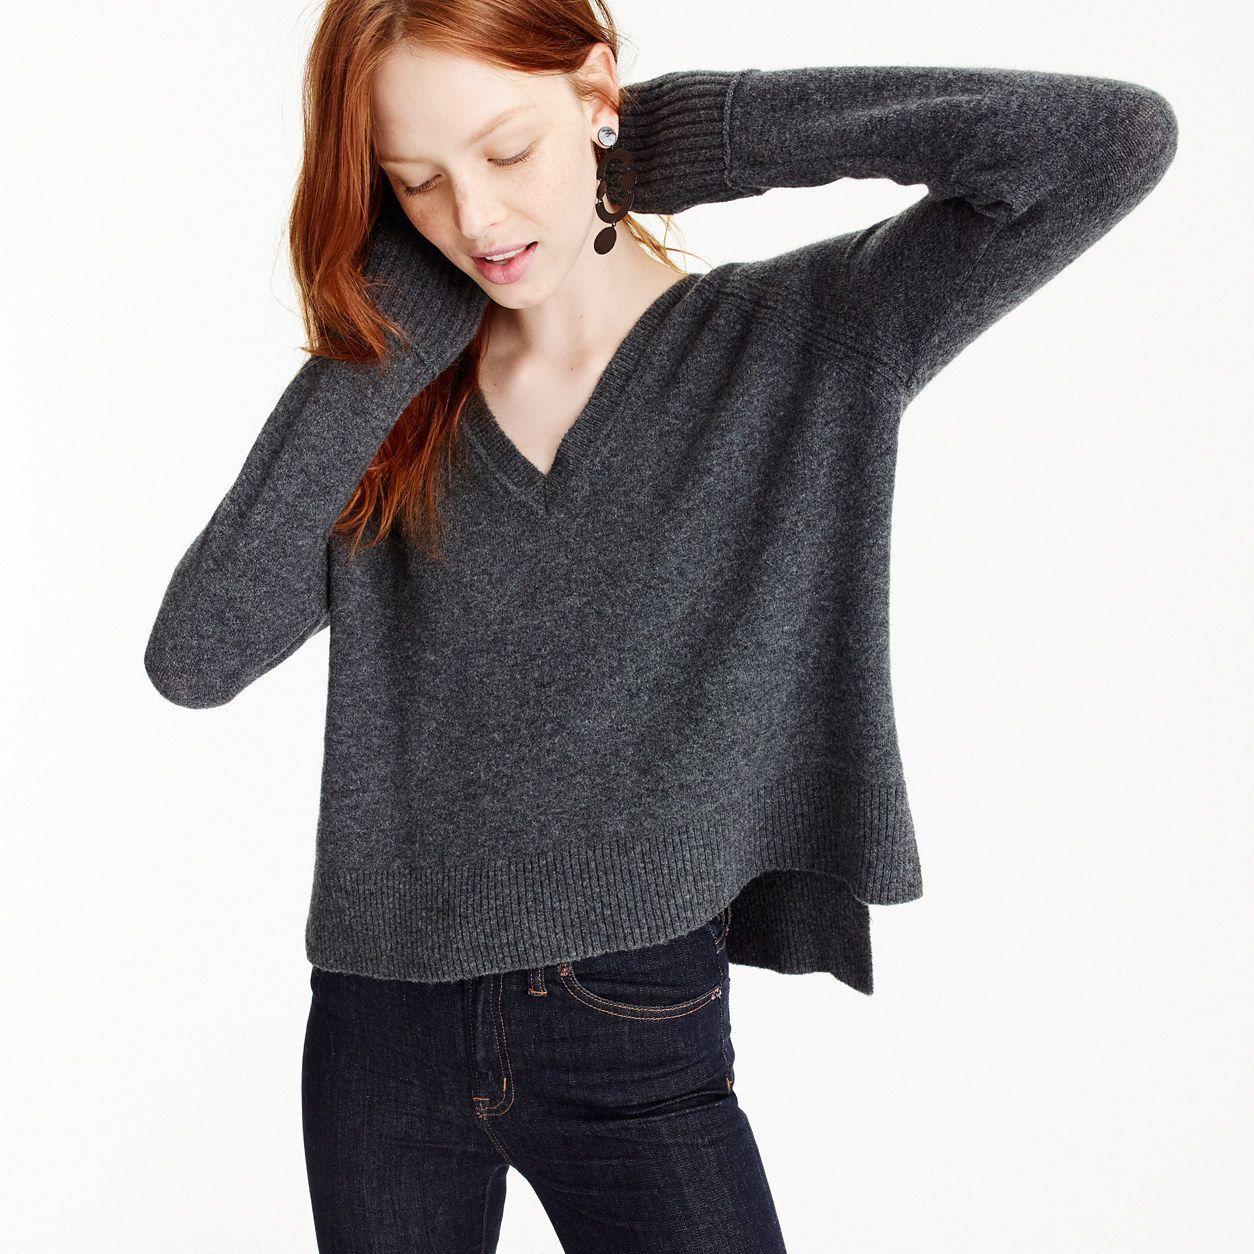 J.Crew Womens V-Neck Sweater In Supersoft Yarn (Size XXXS)  dfd6570398